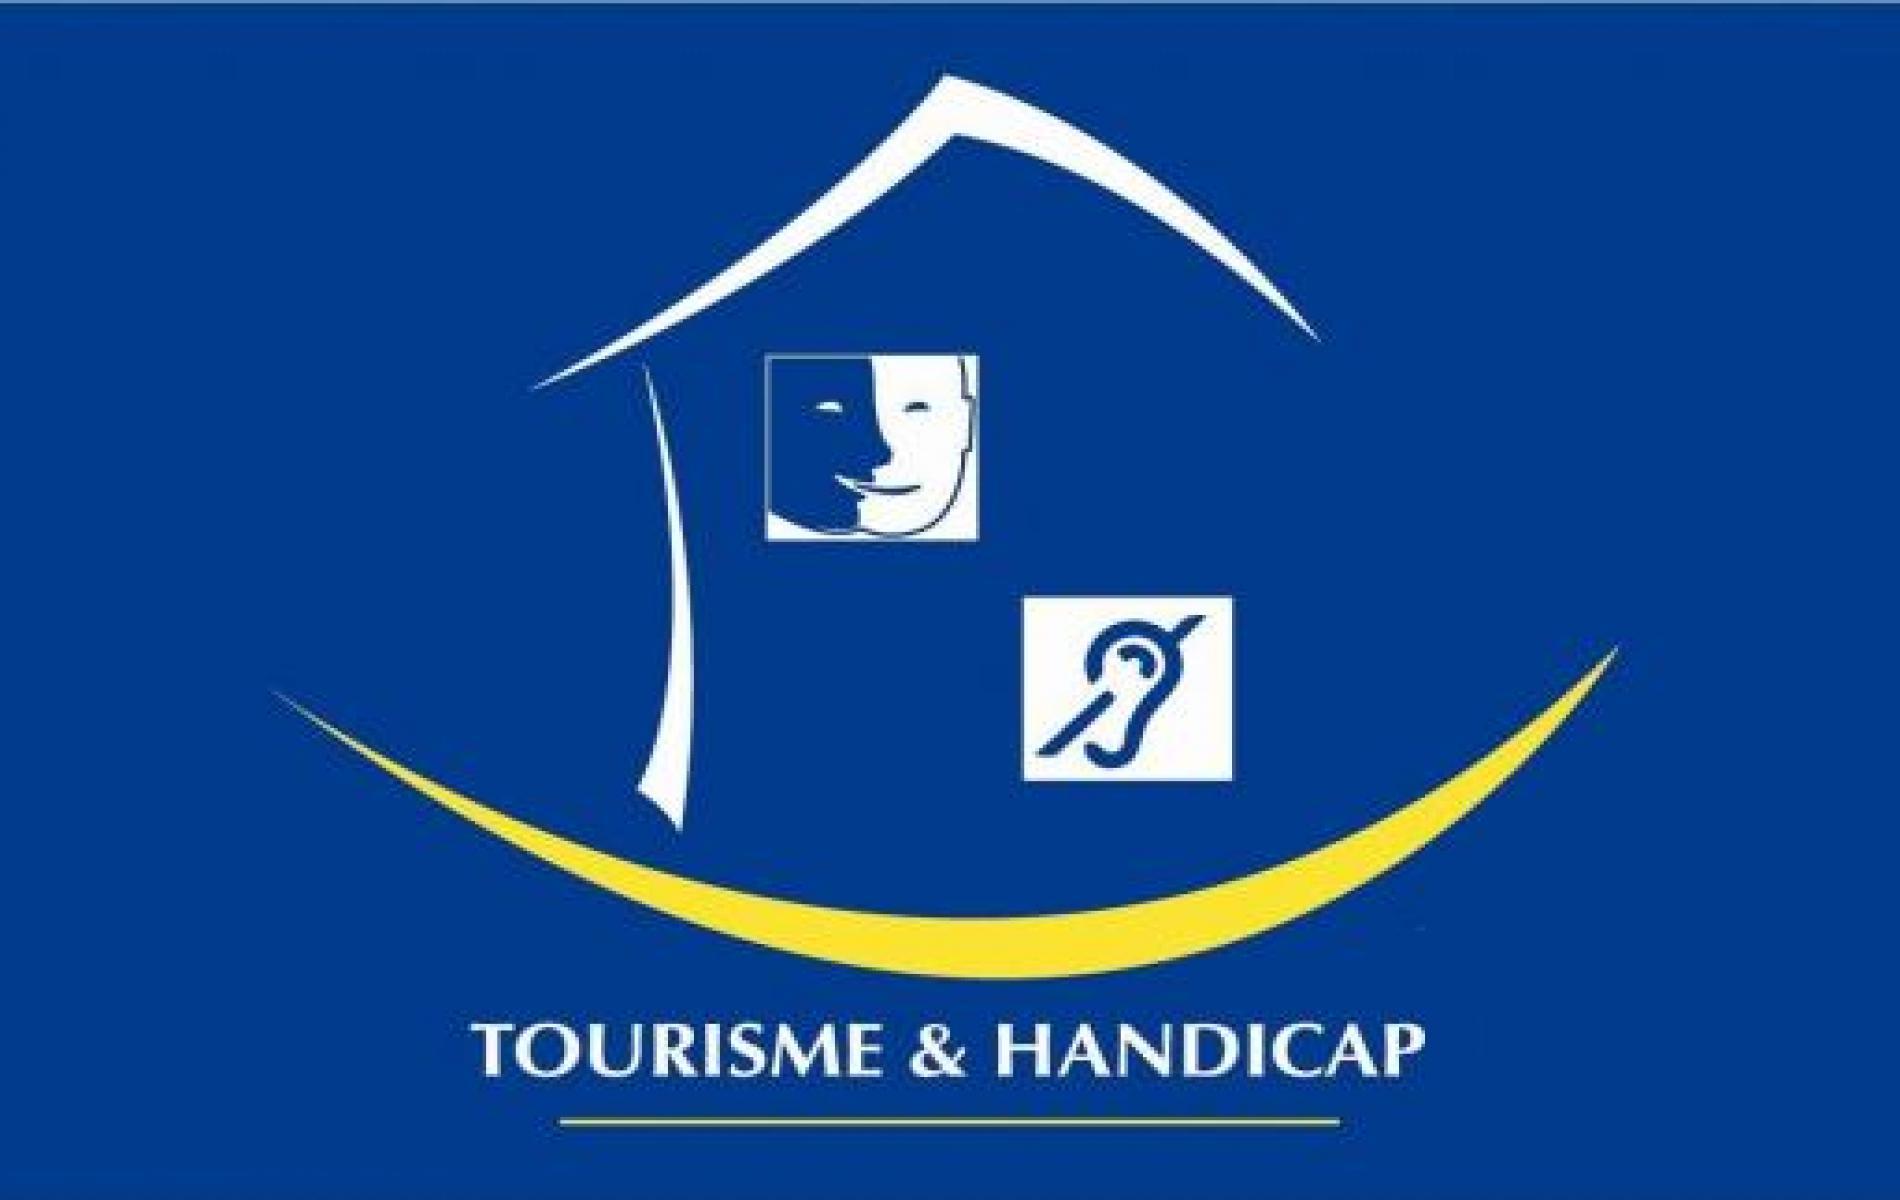 Hotel tourisme handicap